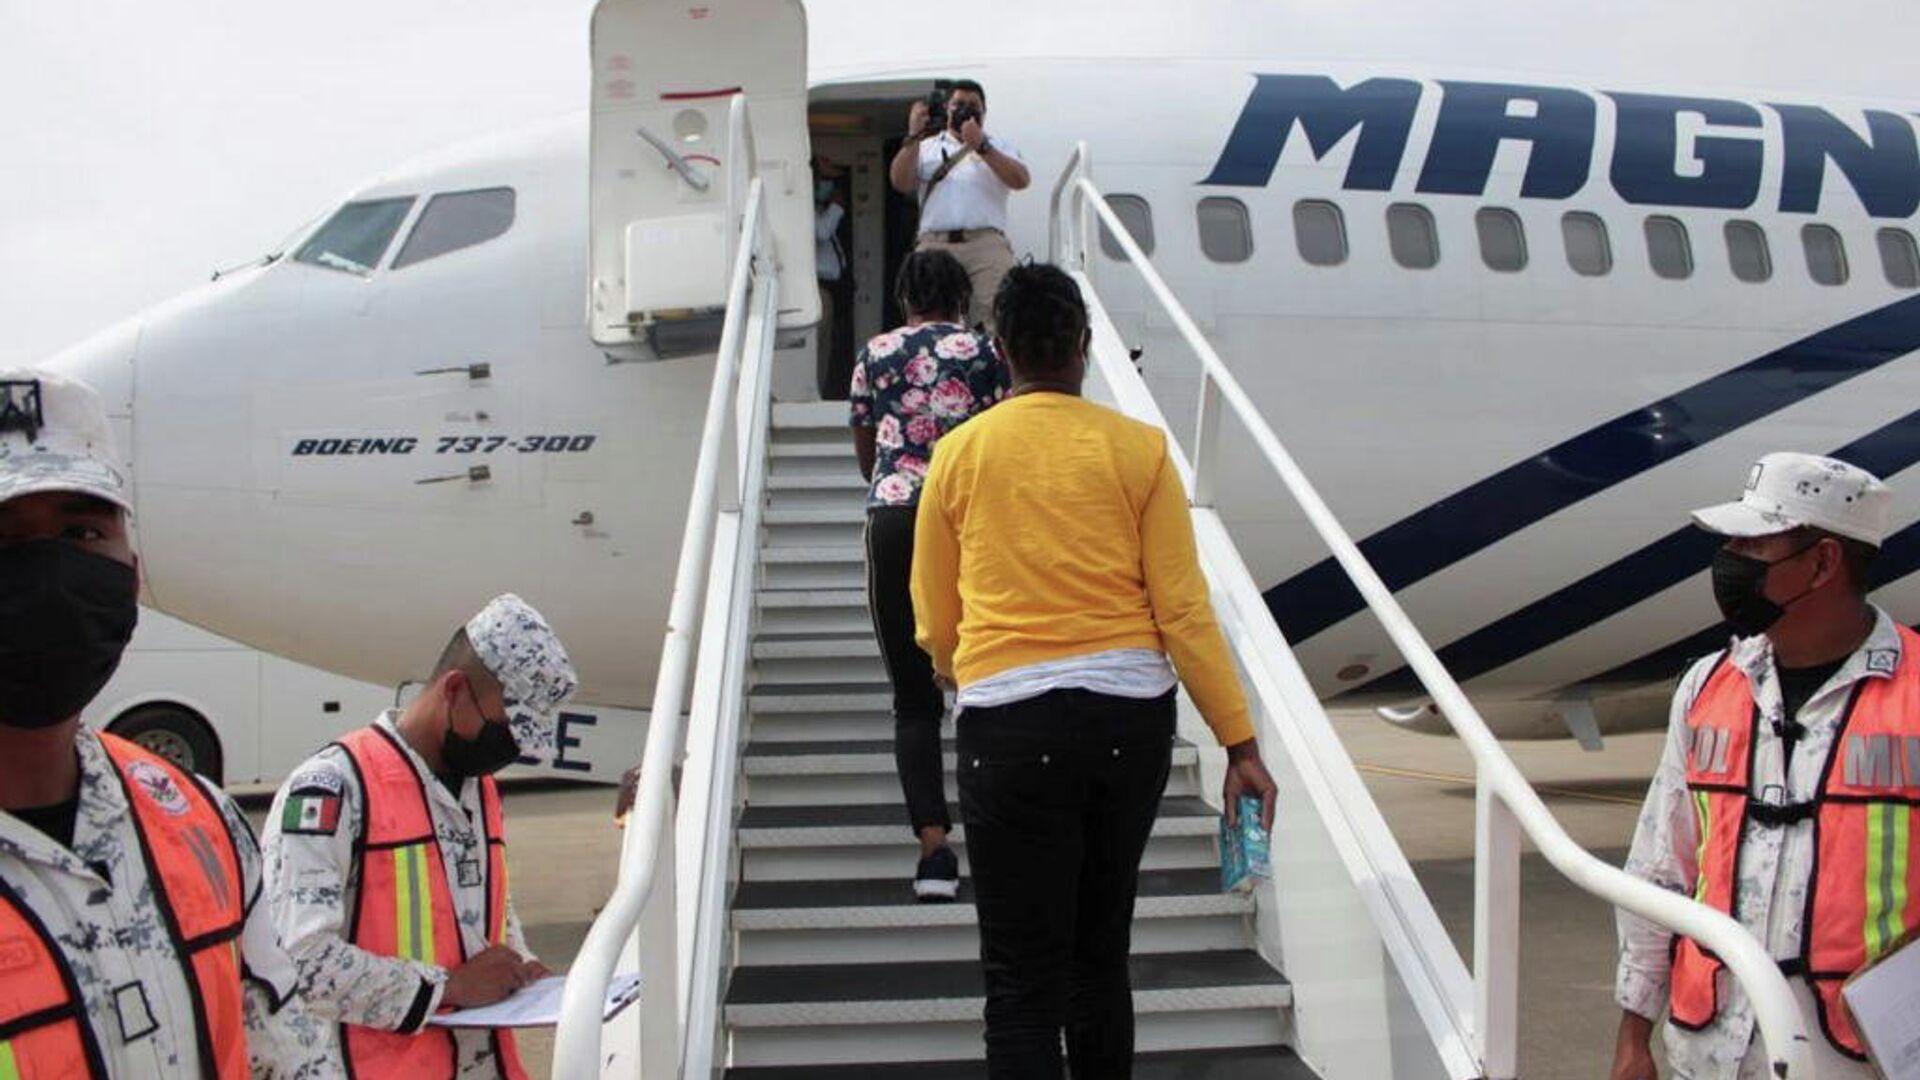 México reinicia vuelos de retorno humanitario hacia Haití  - Sputnik Mundo, 1920, 29.09.2021